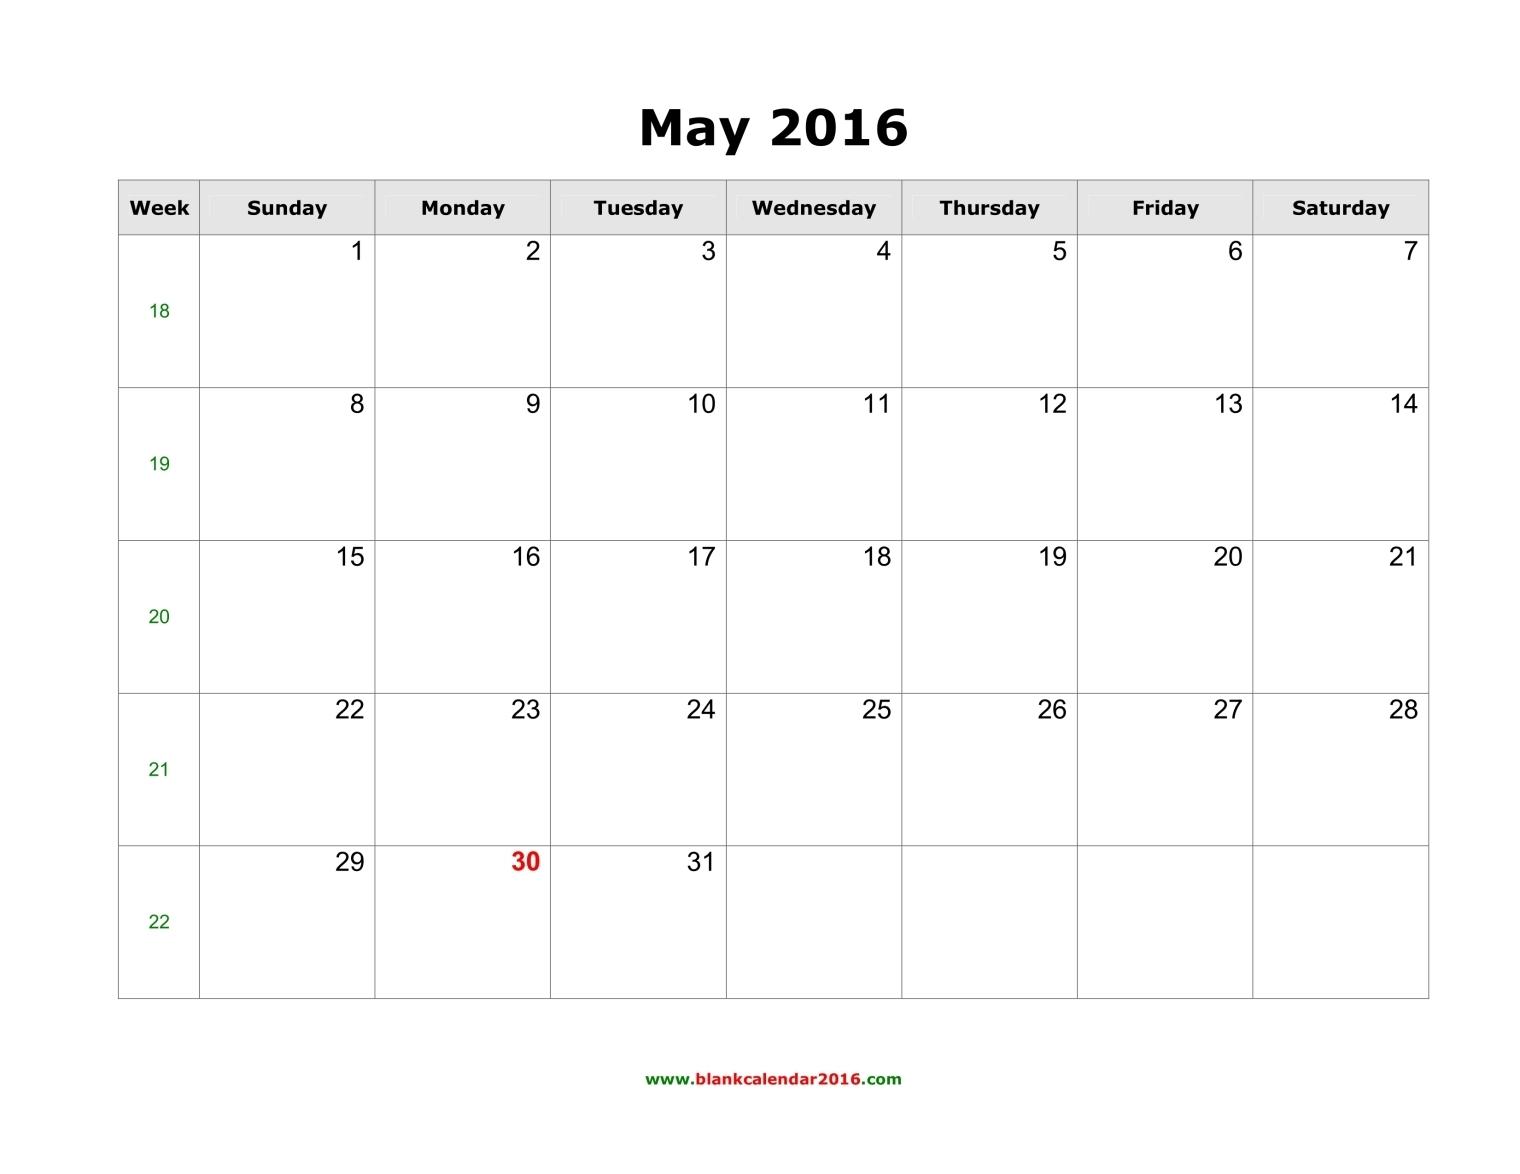 May 2016 Calendar With Flowers – 2017 printable calendar